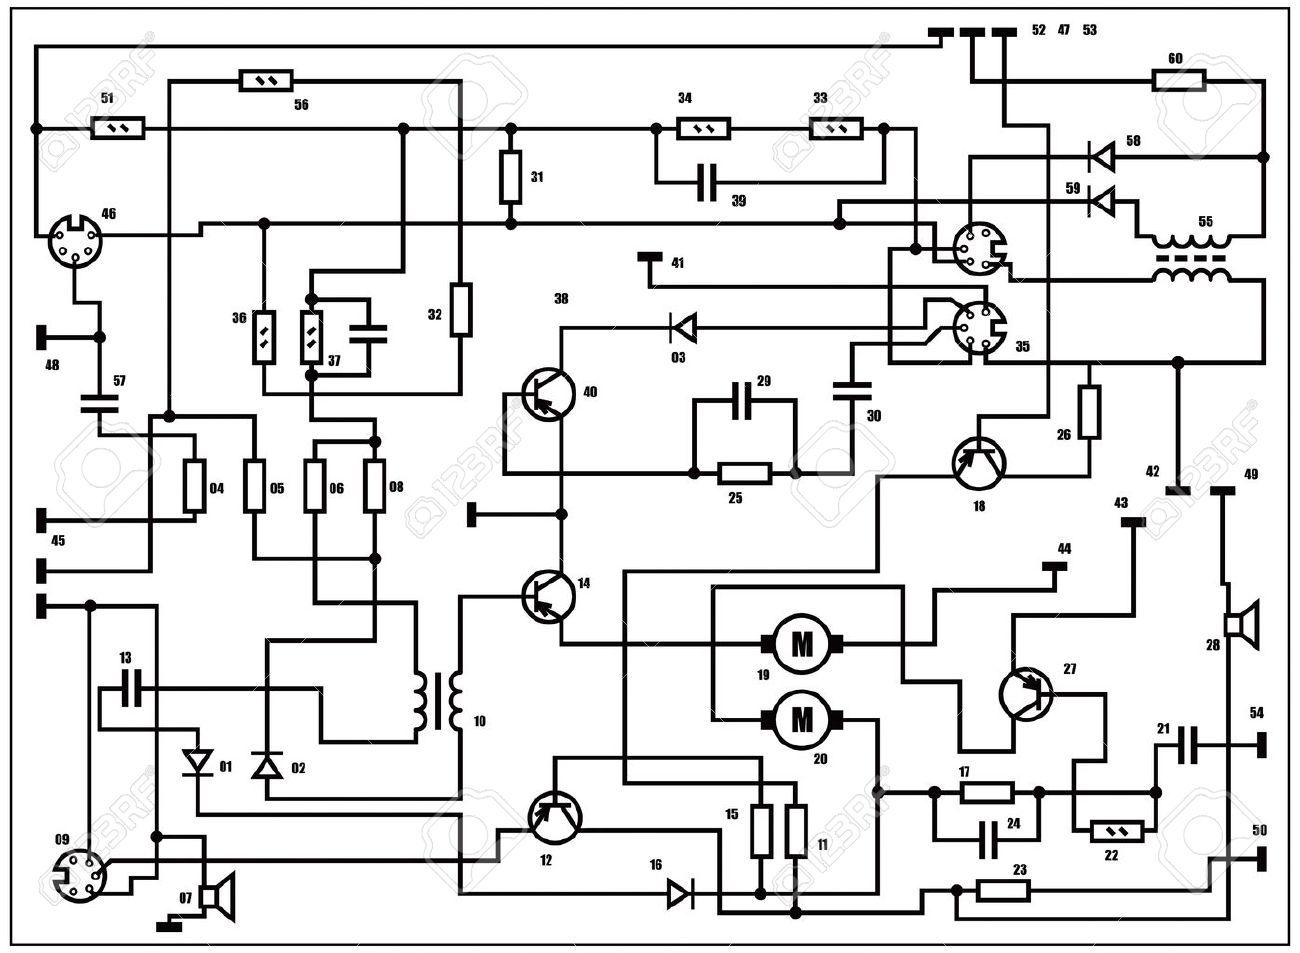 Electric Scheme - Fantasy Technology Background Royalty Free ...